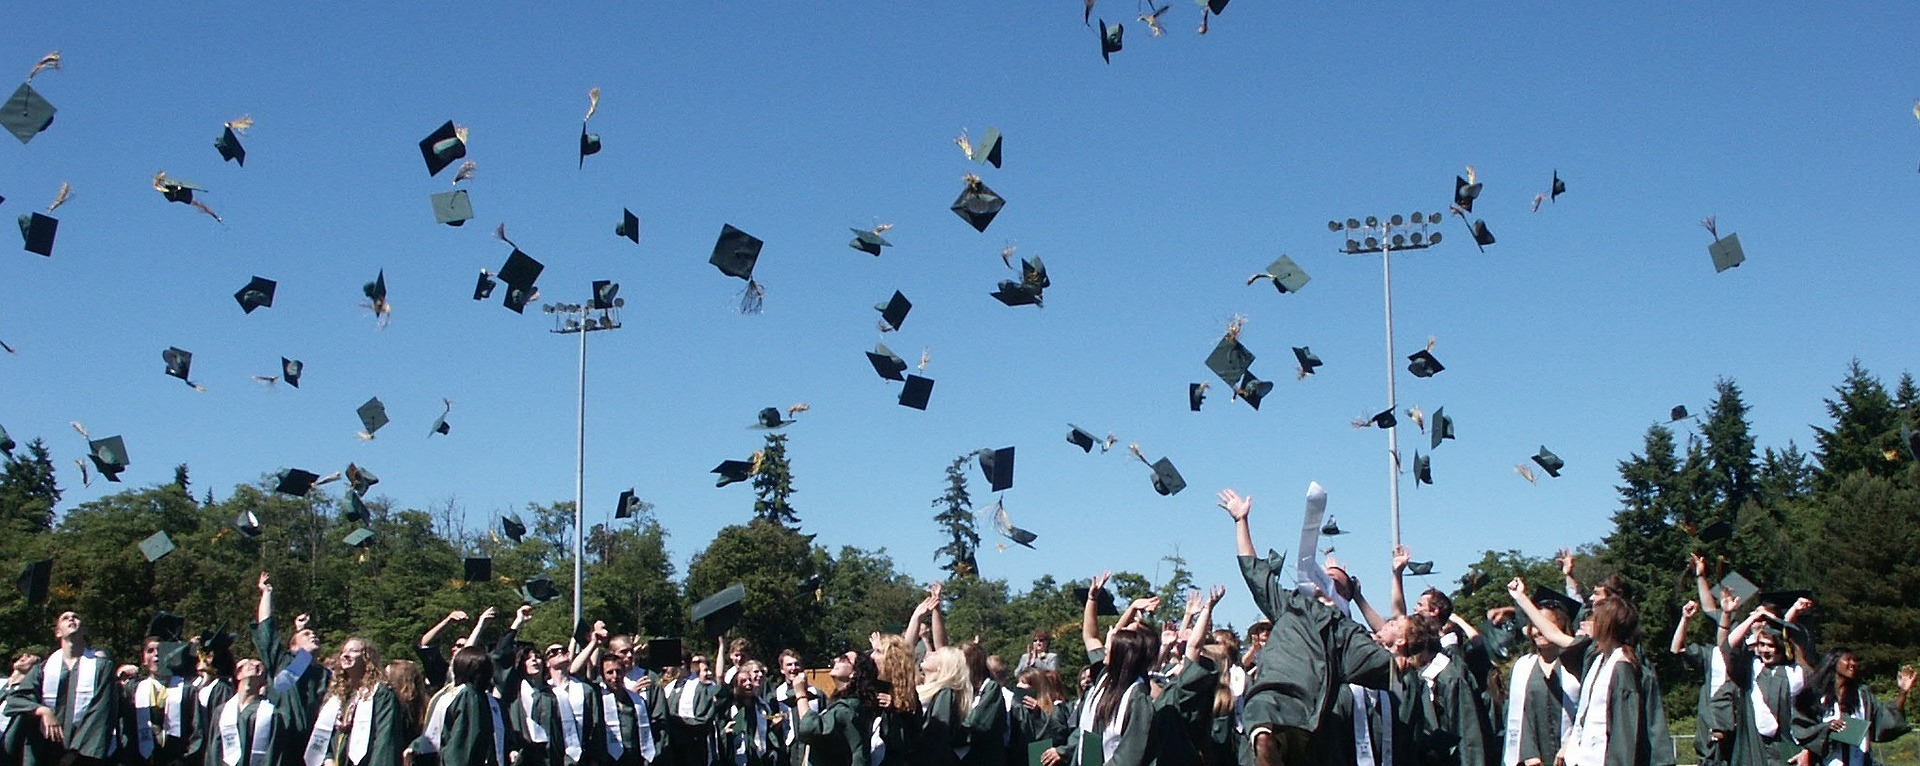 graduation-995042_1920-1